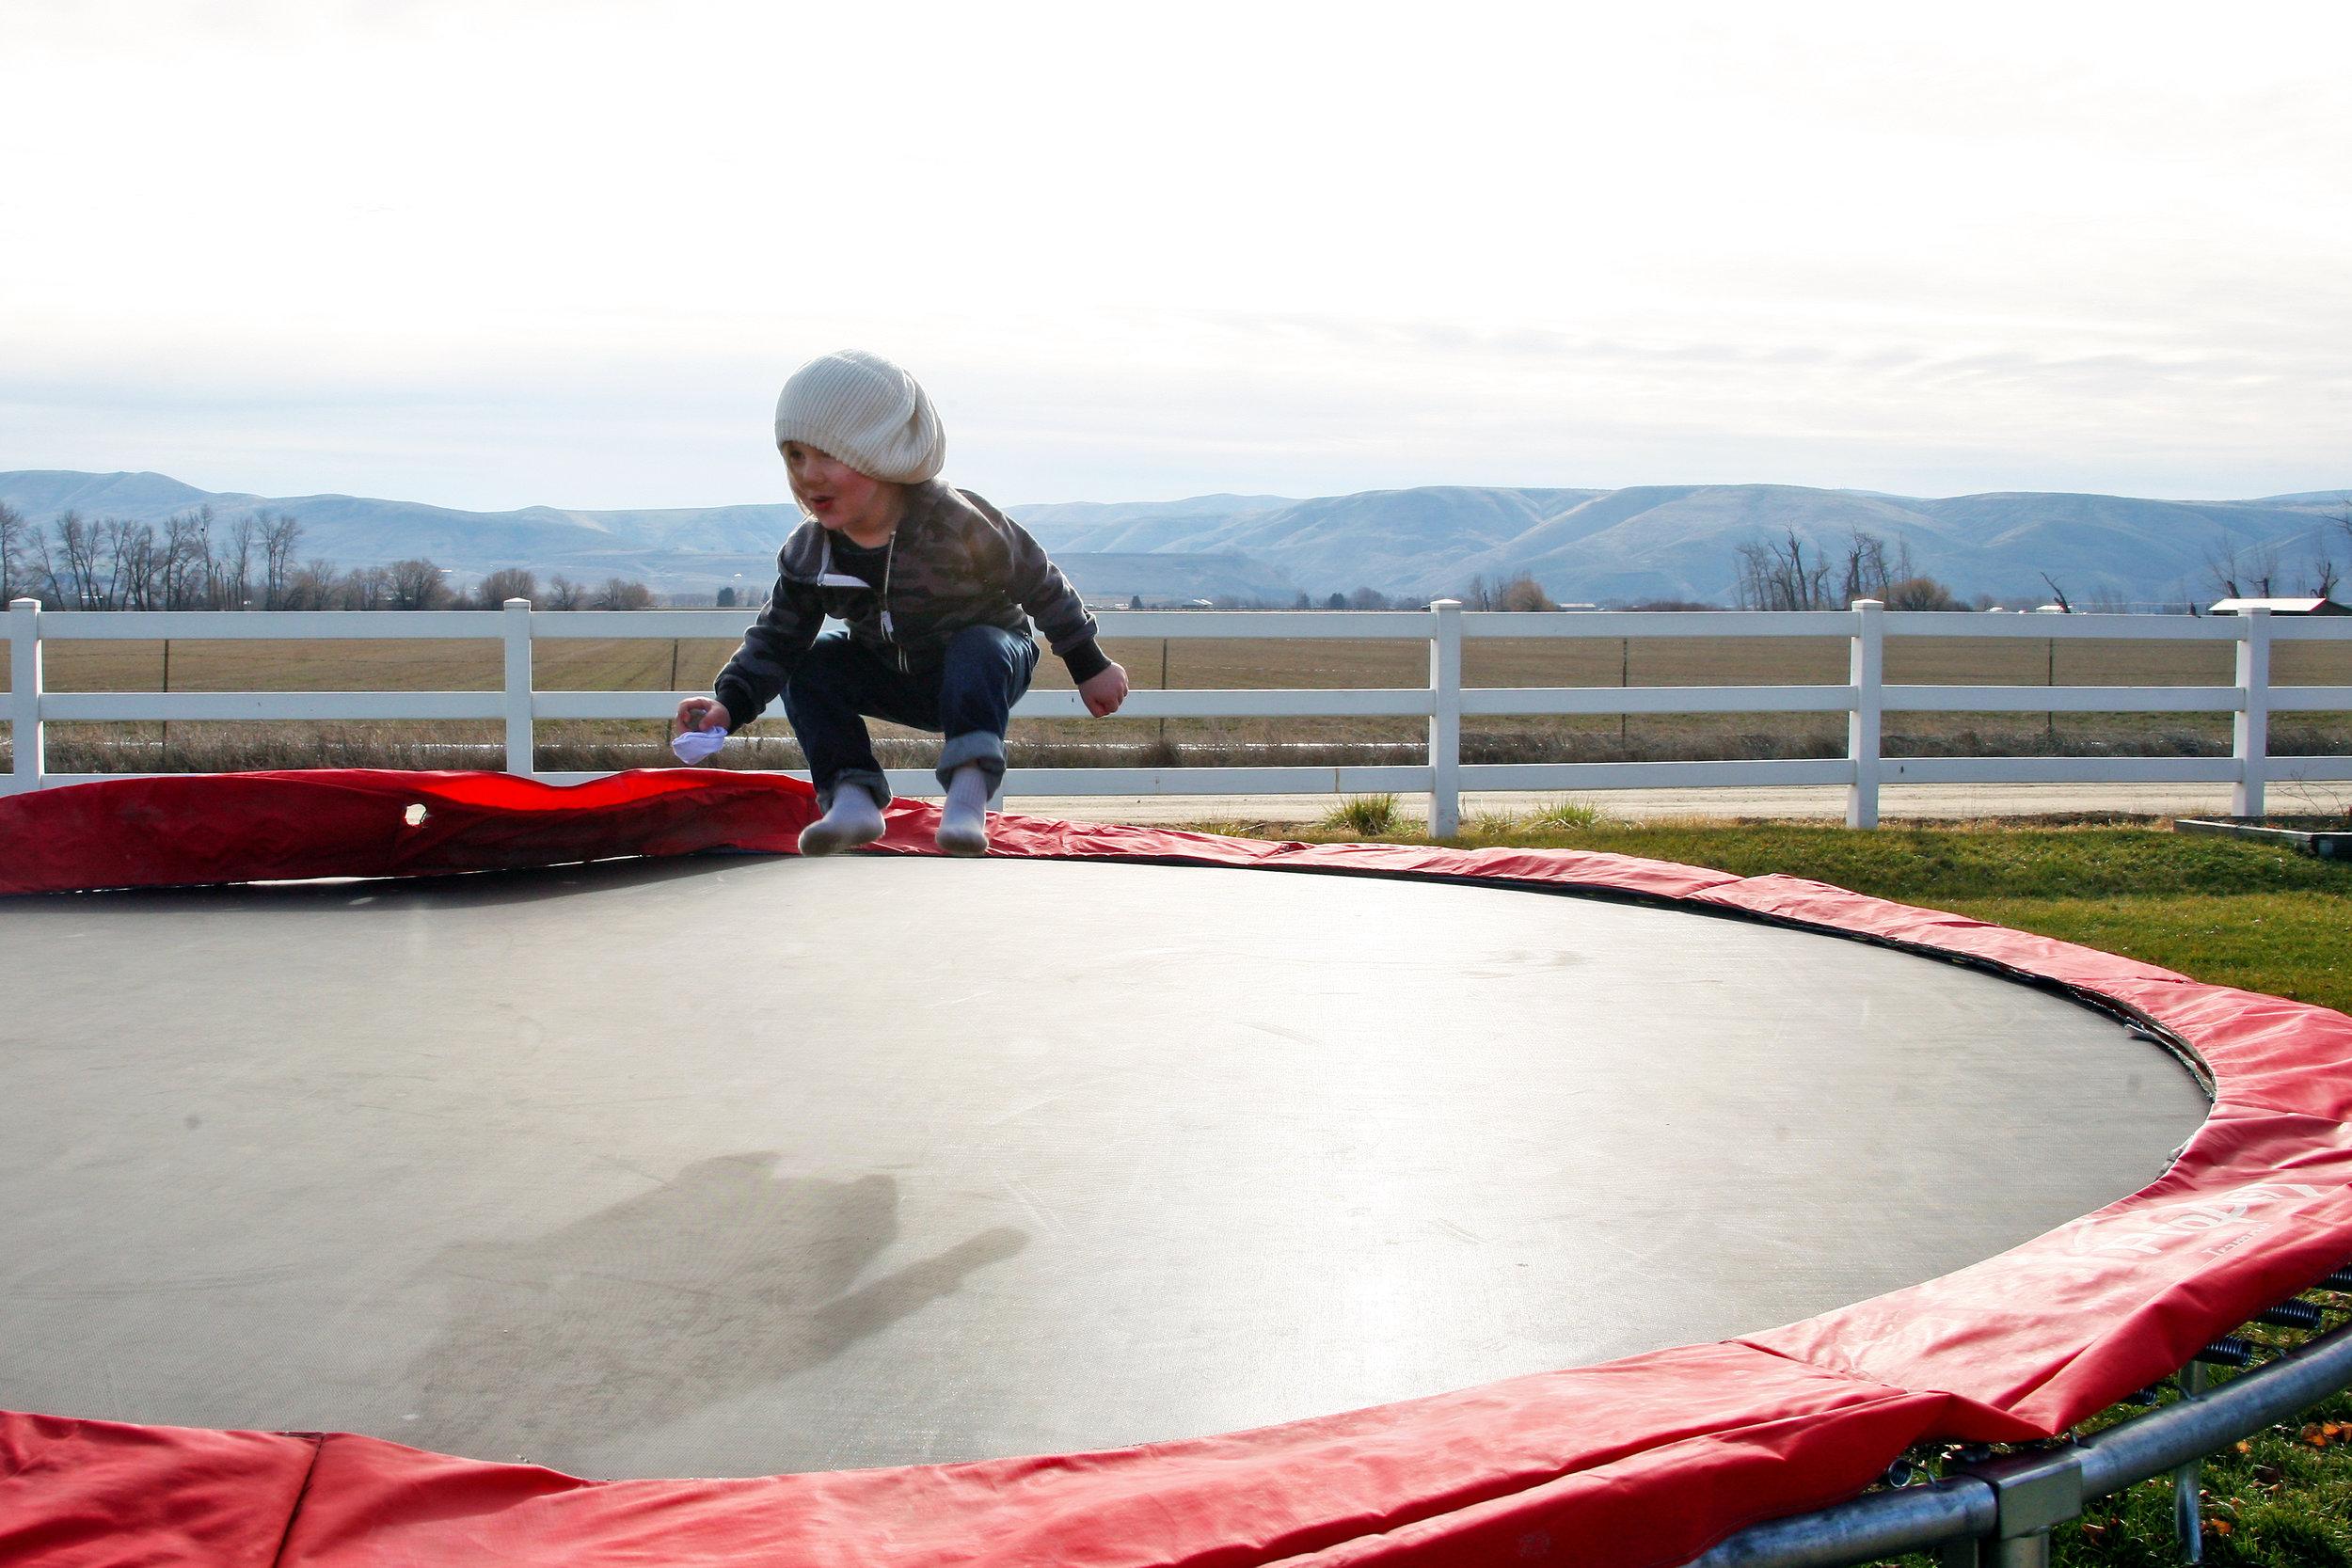 jonas trampoline.jpg